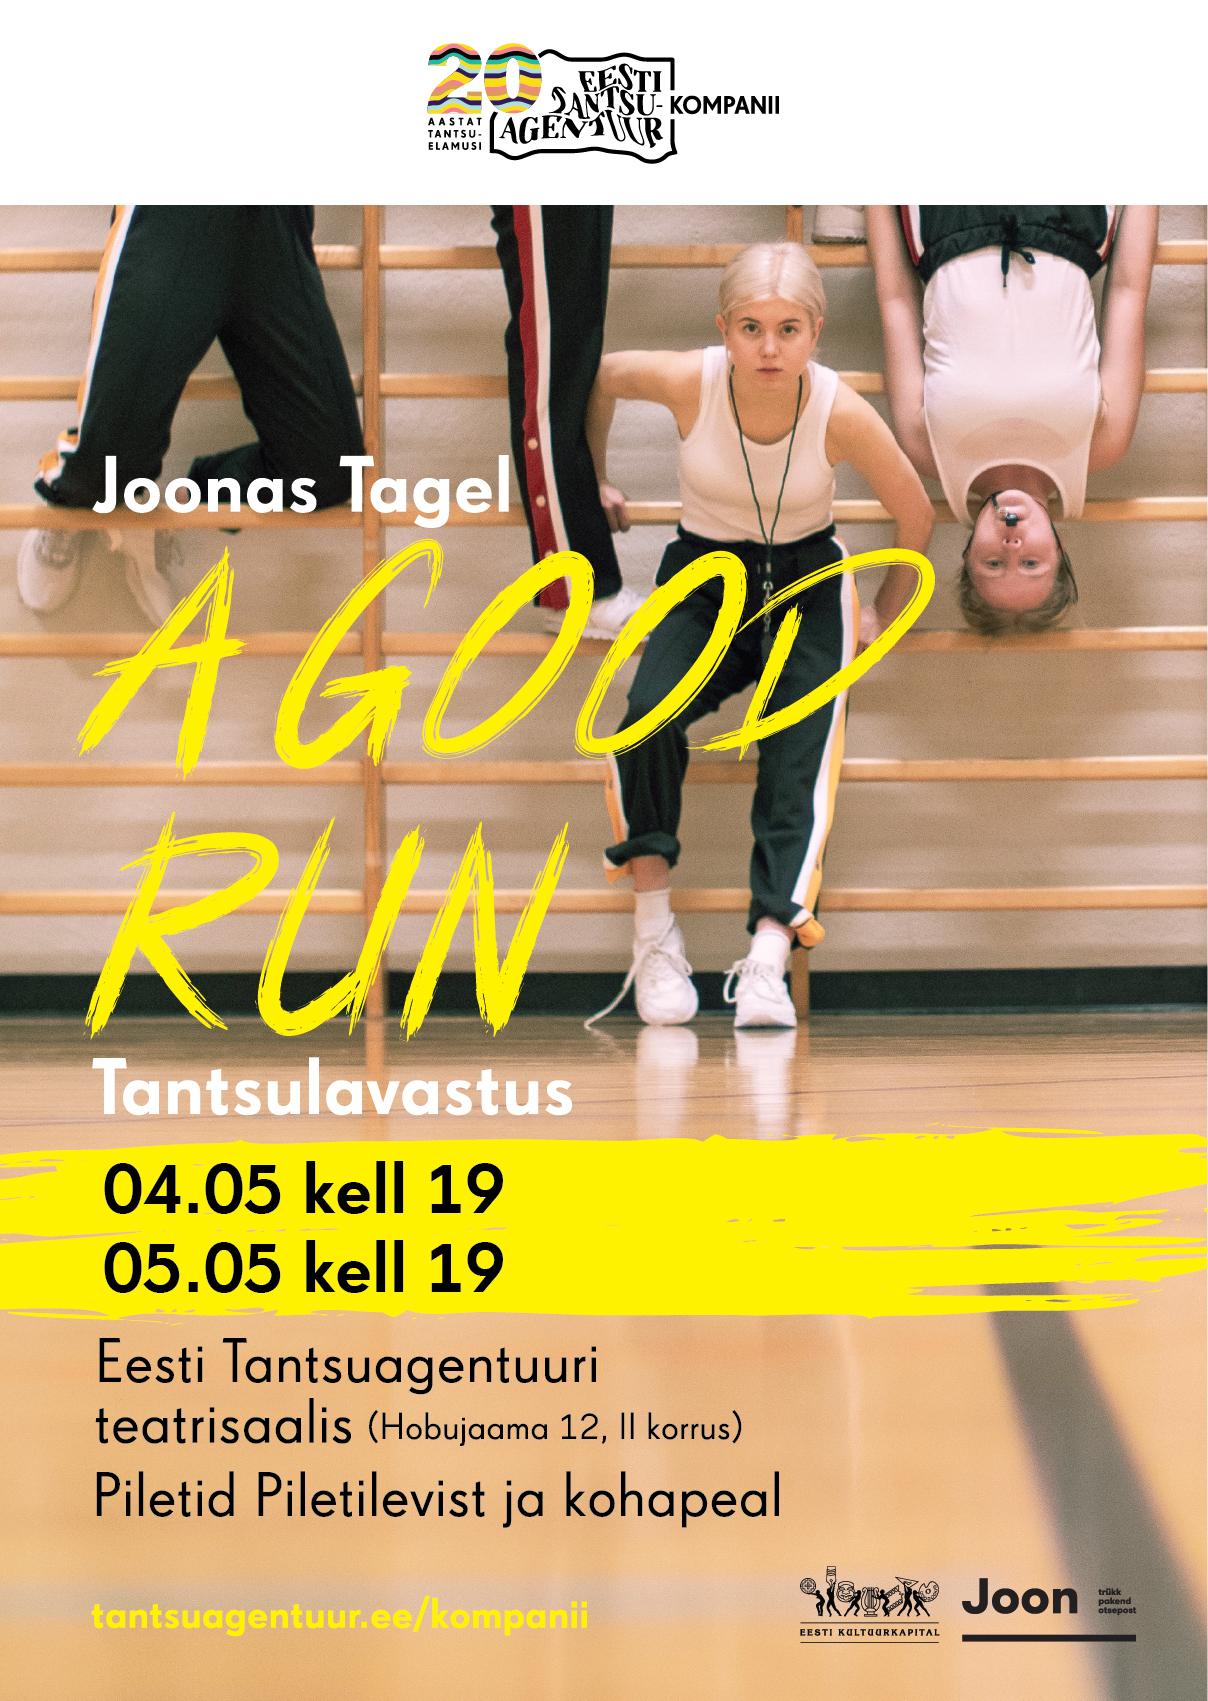 ETA_AgoodRun_Tallinn_mai